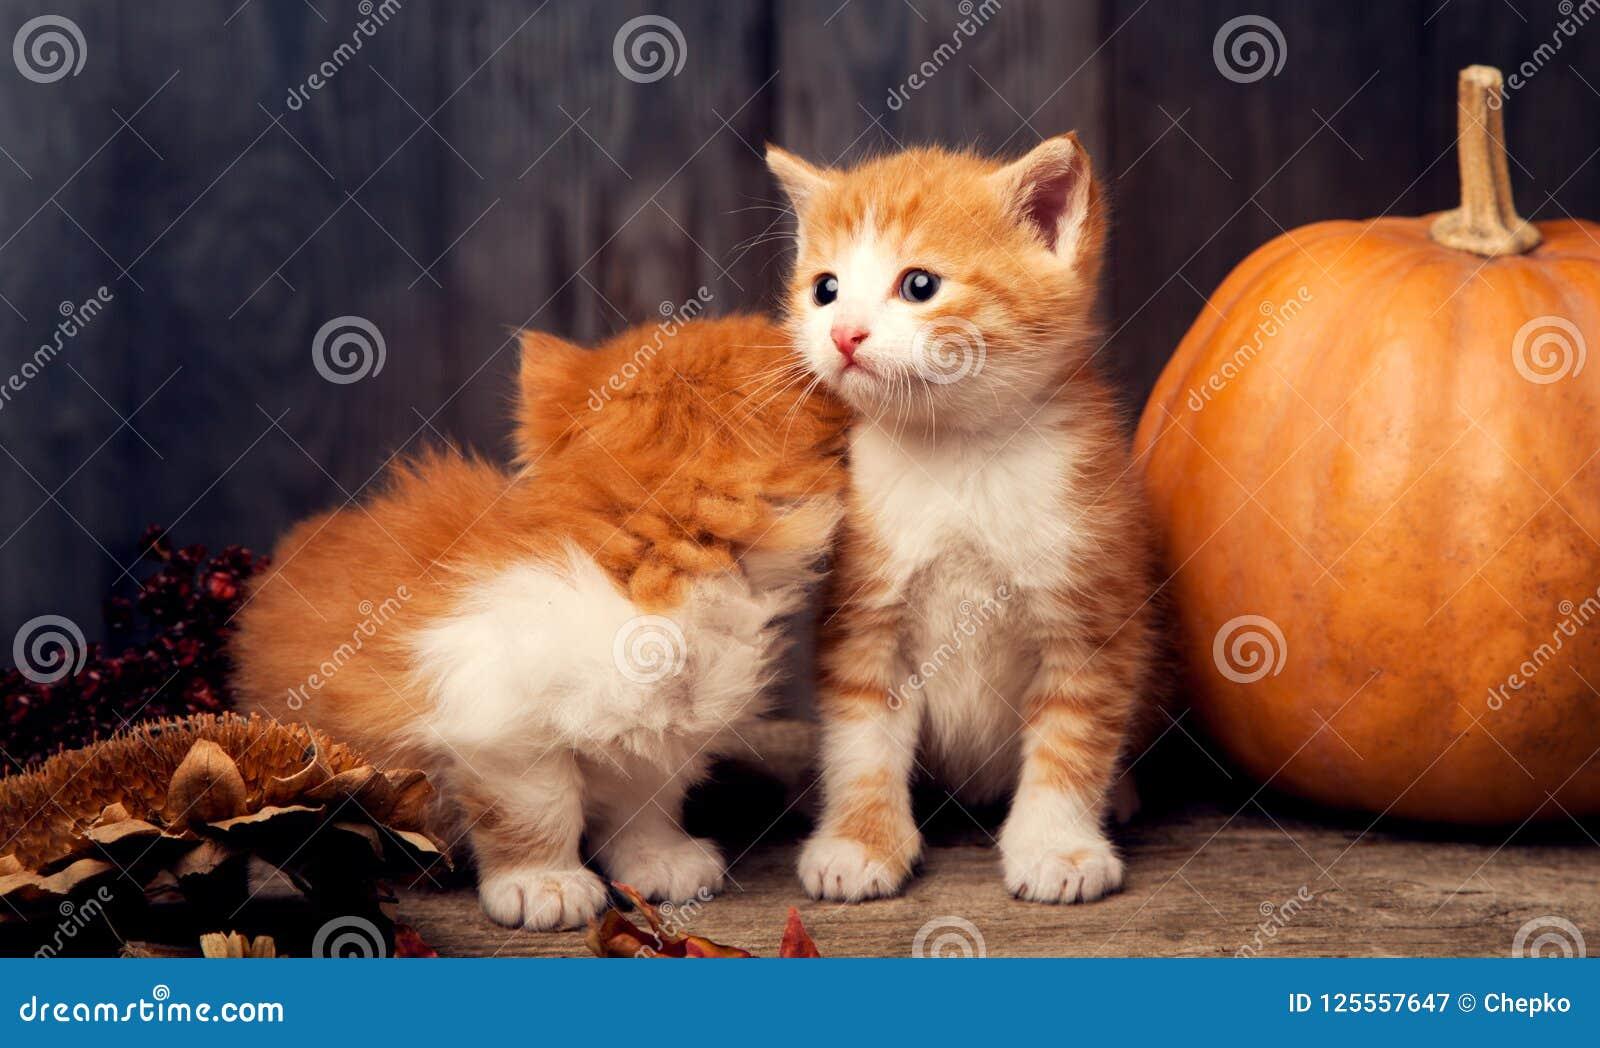 Download Halloween Pumpkin Jack-o-lantern And Ginger Kitten On Black Wood Stock Image - Image of leaves, jack: 125557647